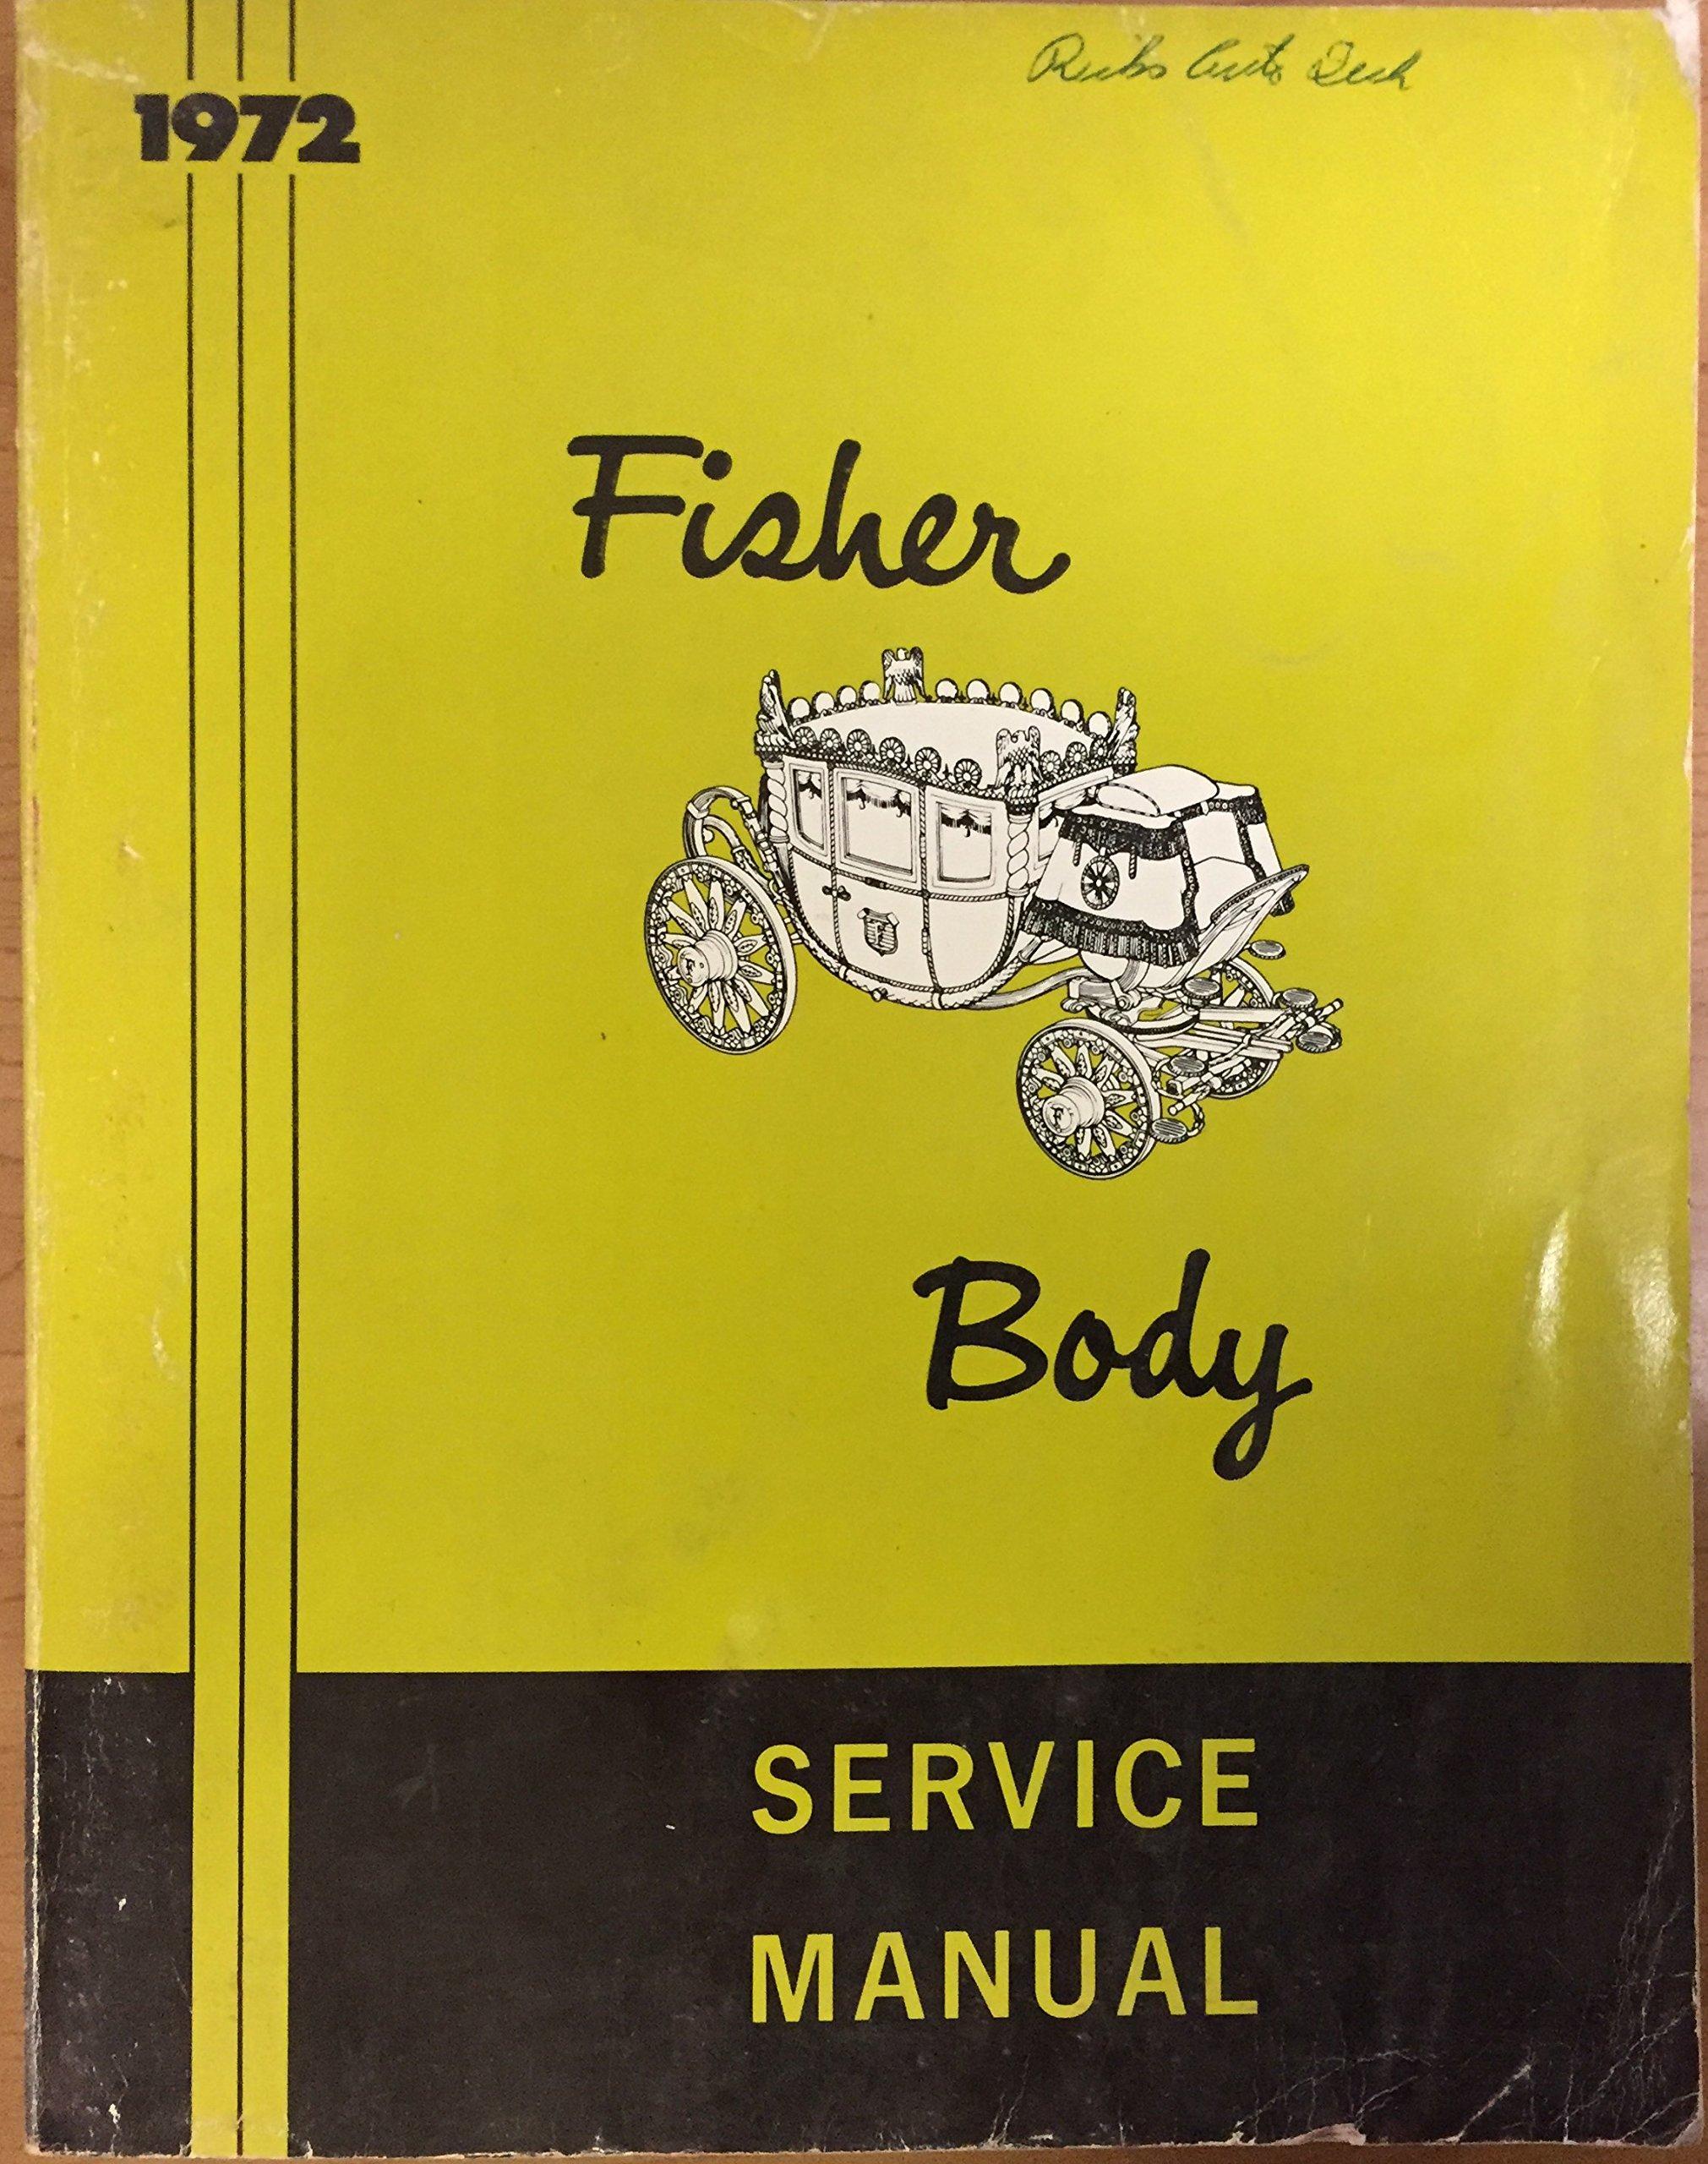 1972 Camaro Fisher Body Manual